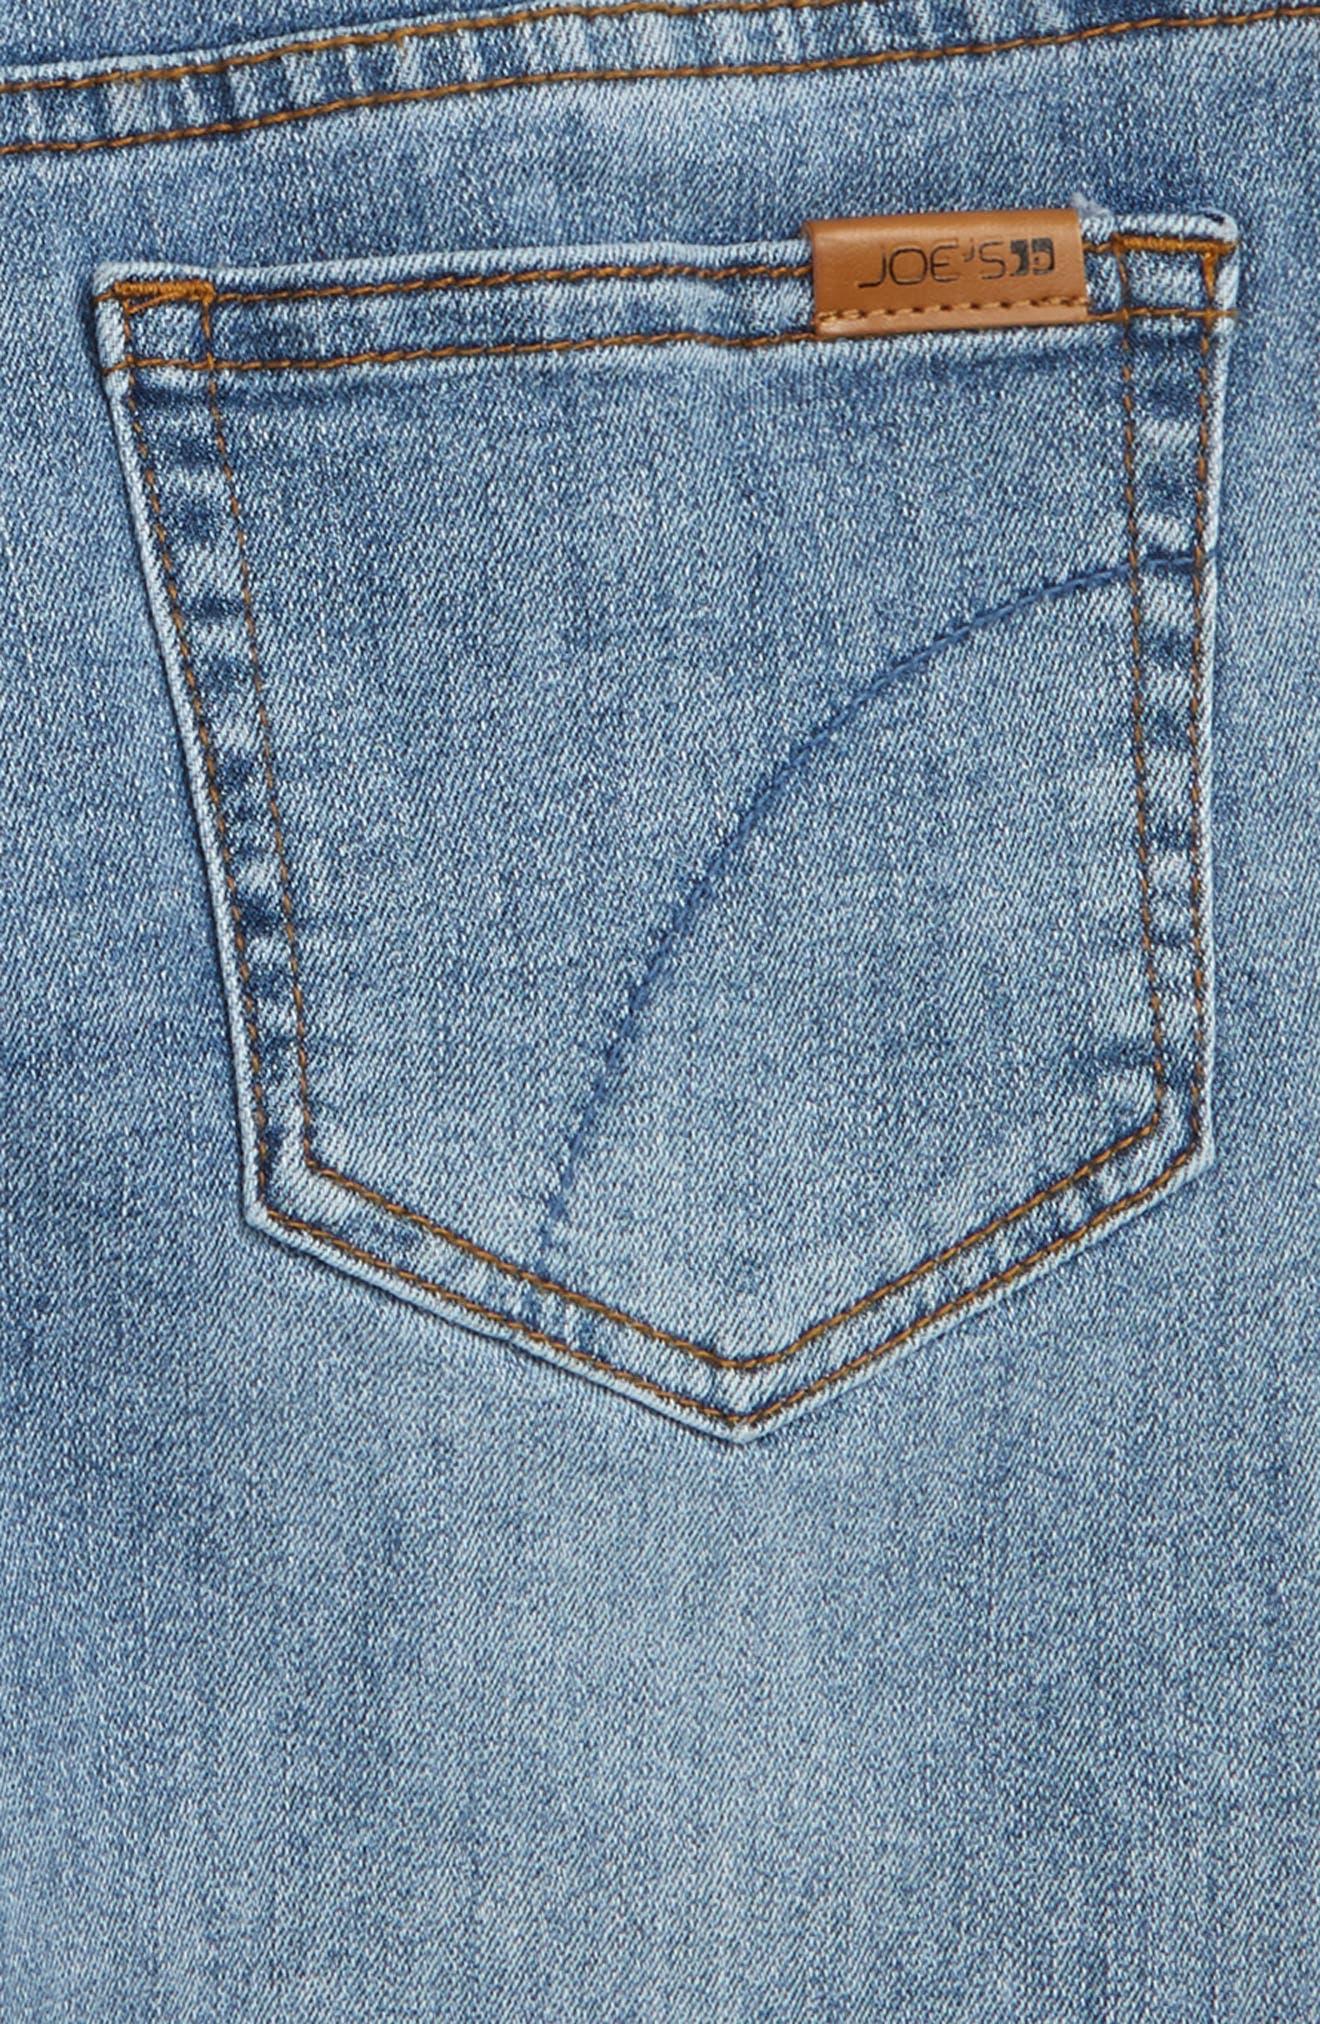 JOE'S, The Finn Cutoff Denim Bermuda Shorts, Alternate thumbnail 3, color, THOMPSON